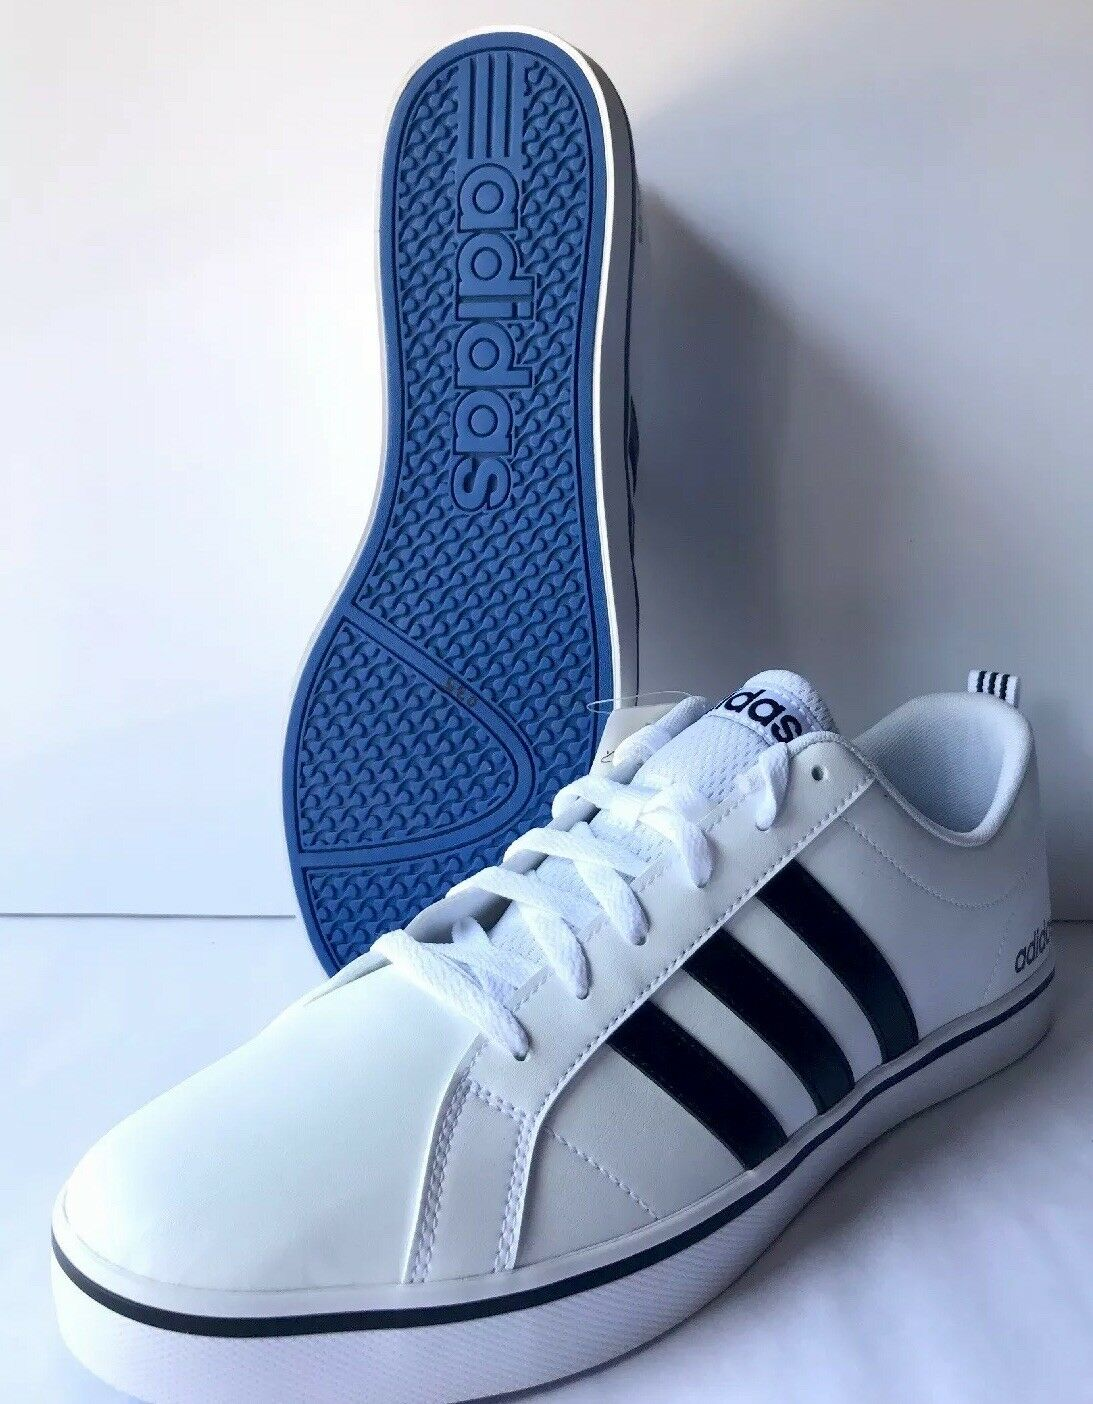 Adidas neo Uomo ritmo vs scarpa, bianco / nero / blu, ci nwt m